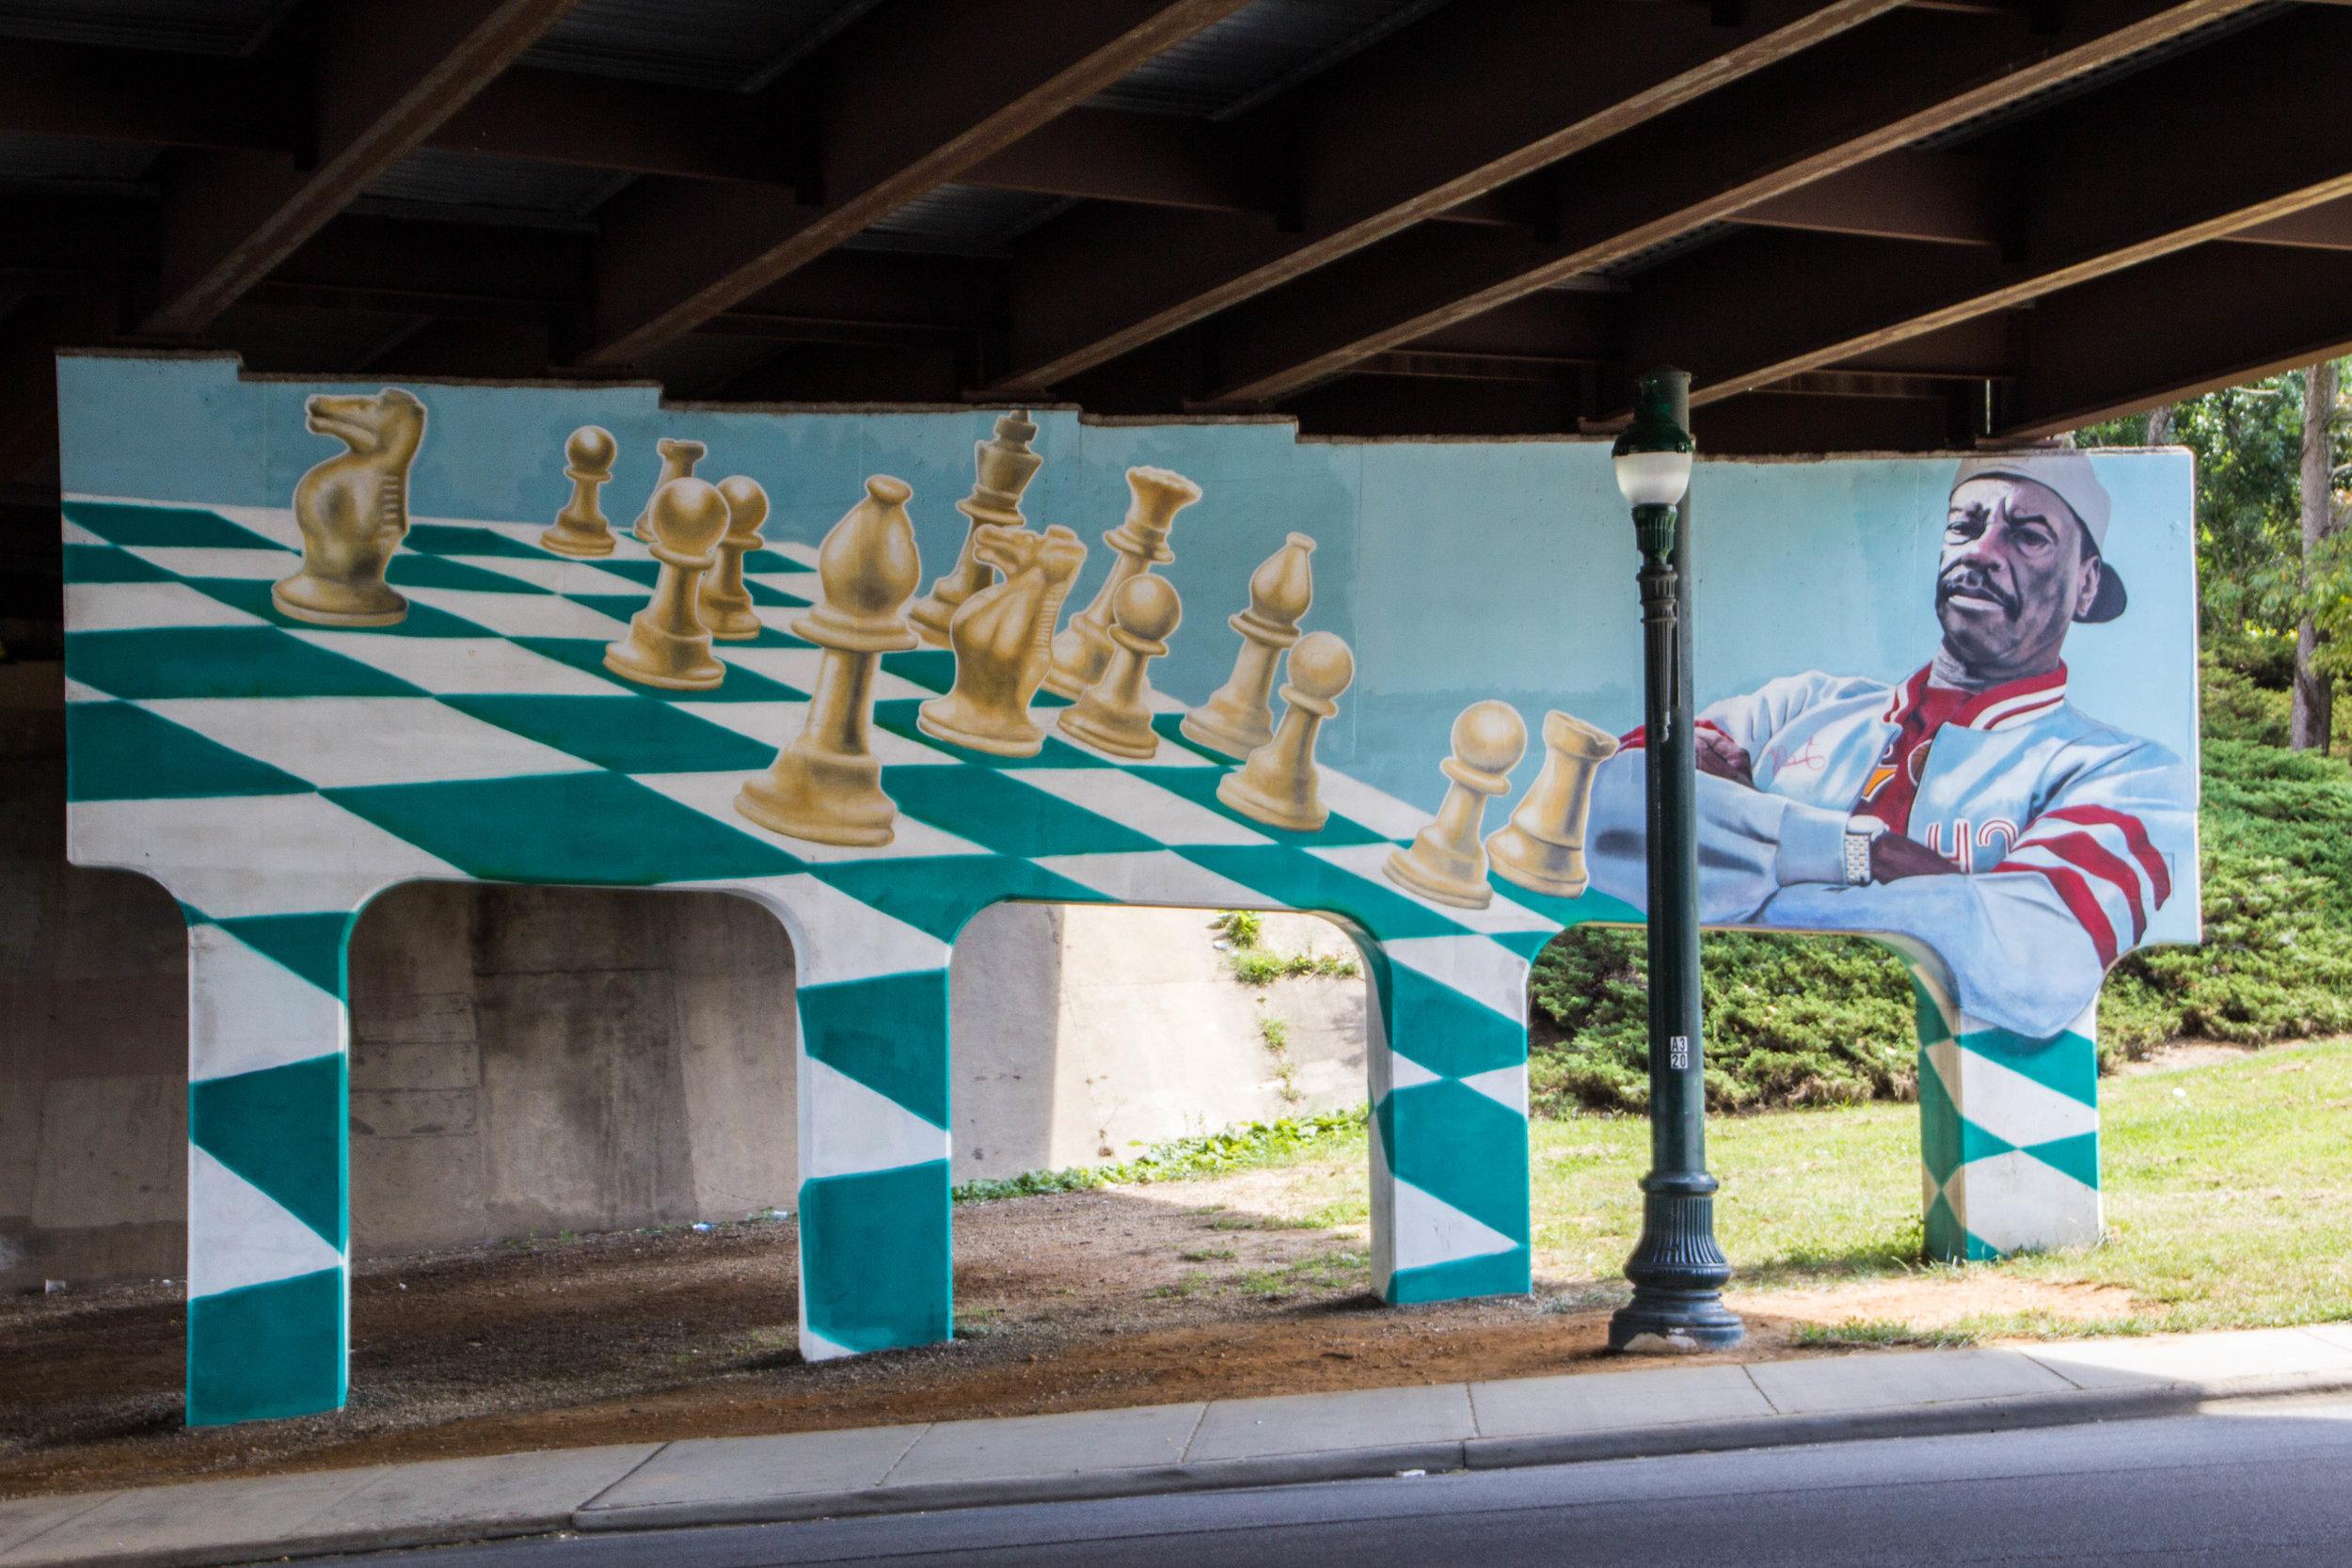 street-art-asheville-north-carolina-17.jpg